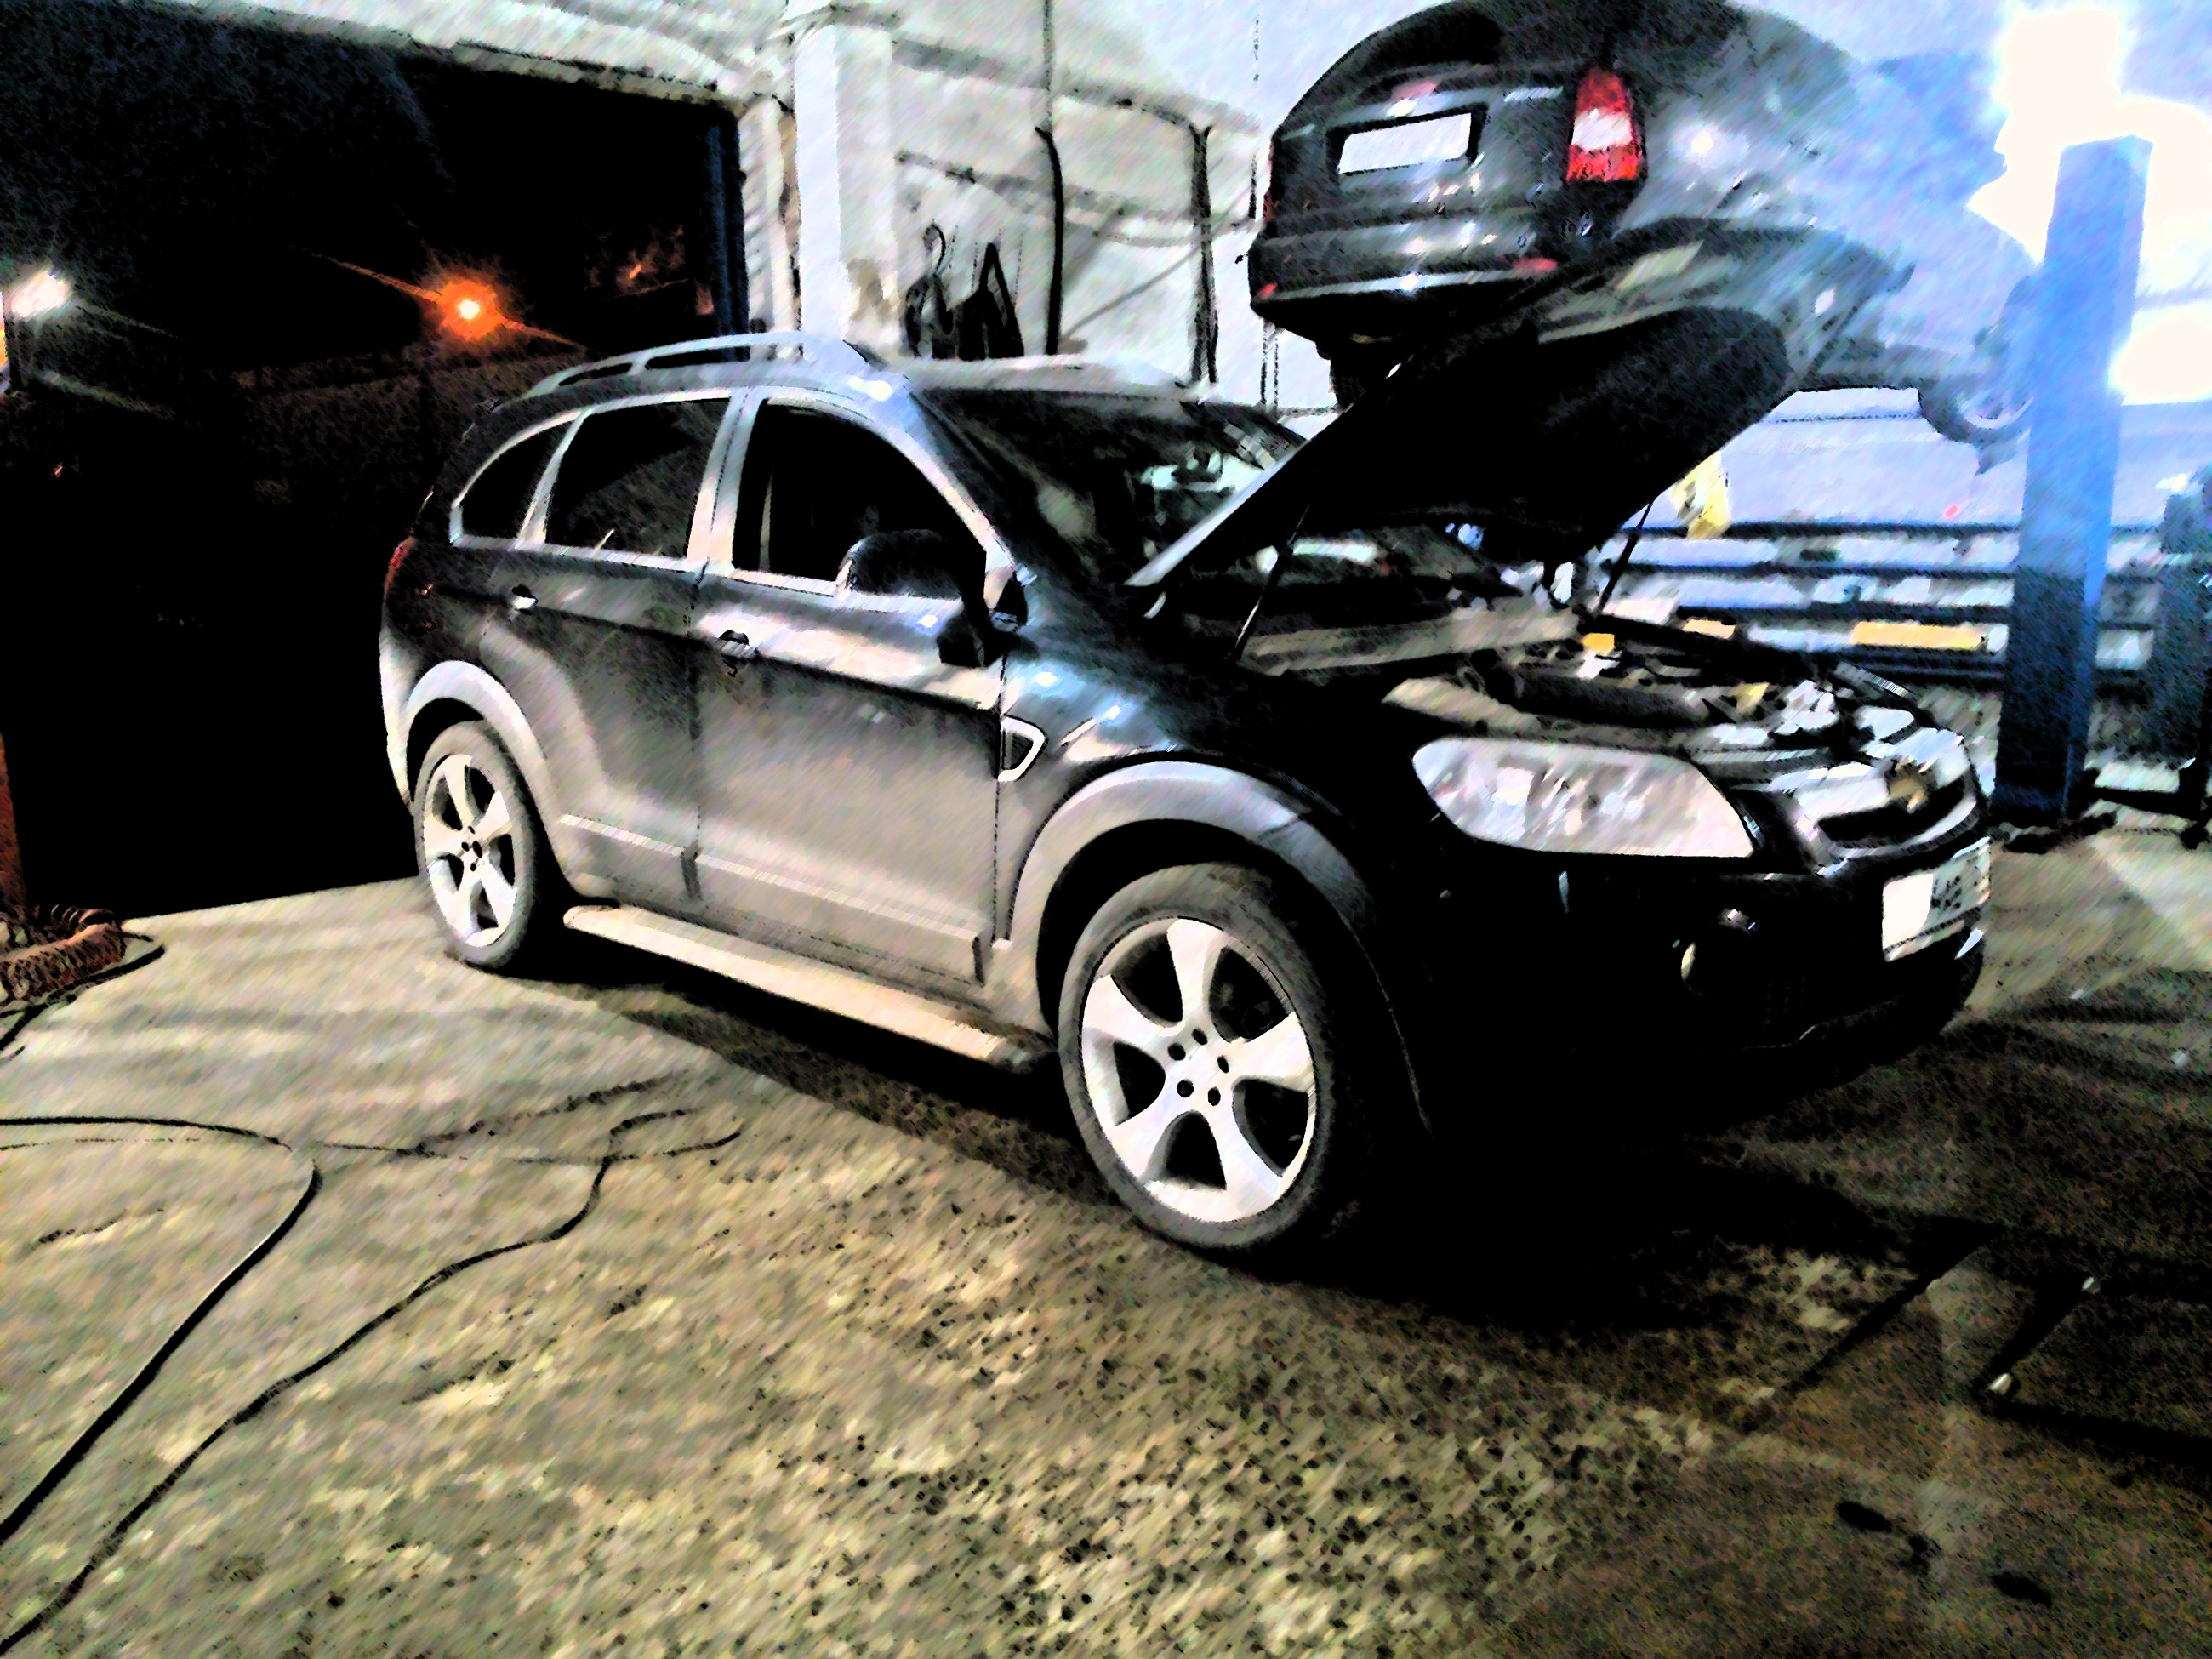 Чип-тюнинг Chevrolet Captiva 3.2 V6 24V 211 л.с. 297Нм АКПП 2011г.в.